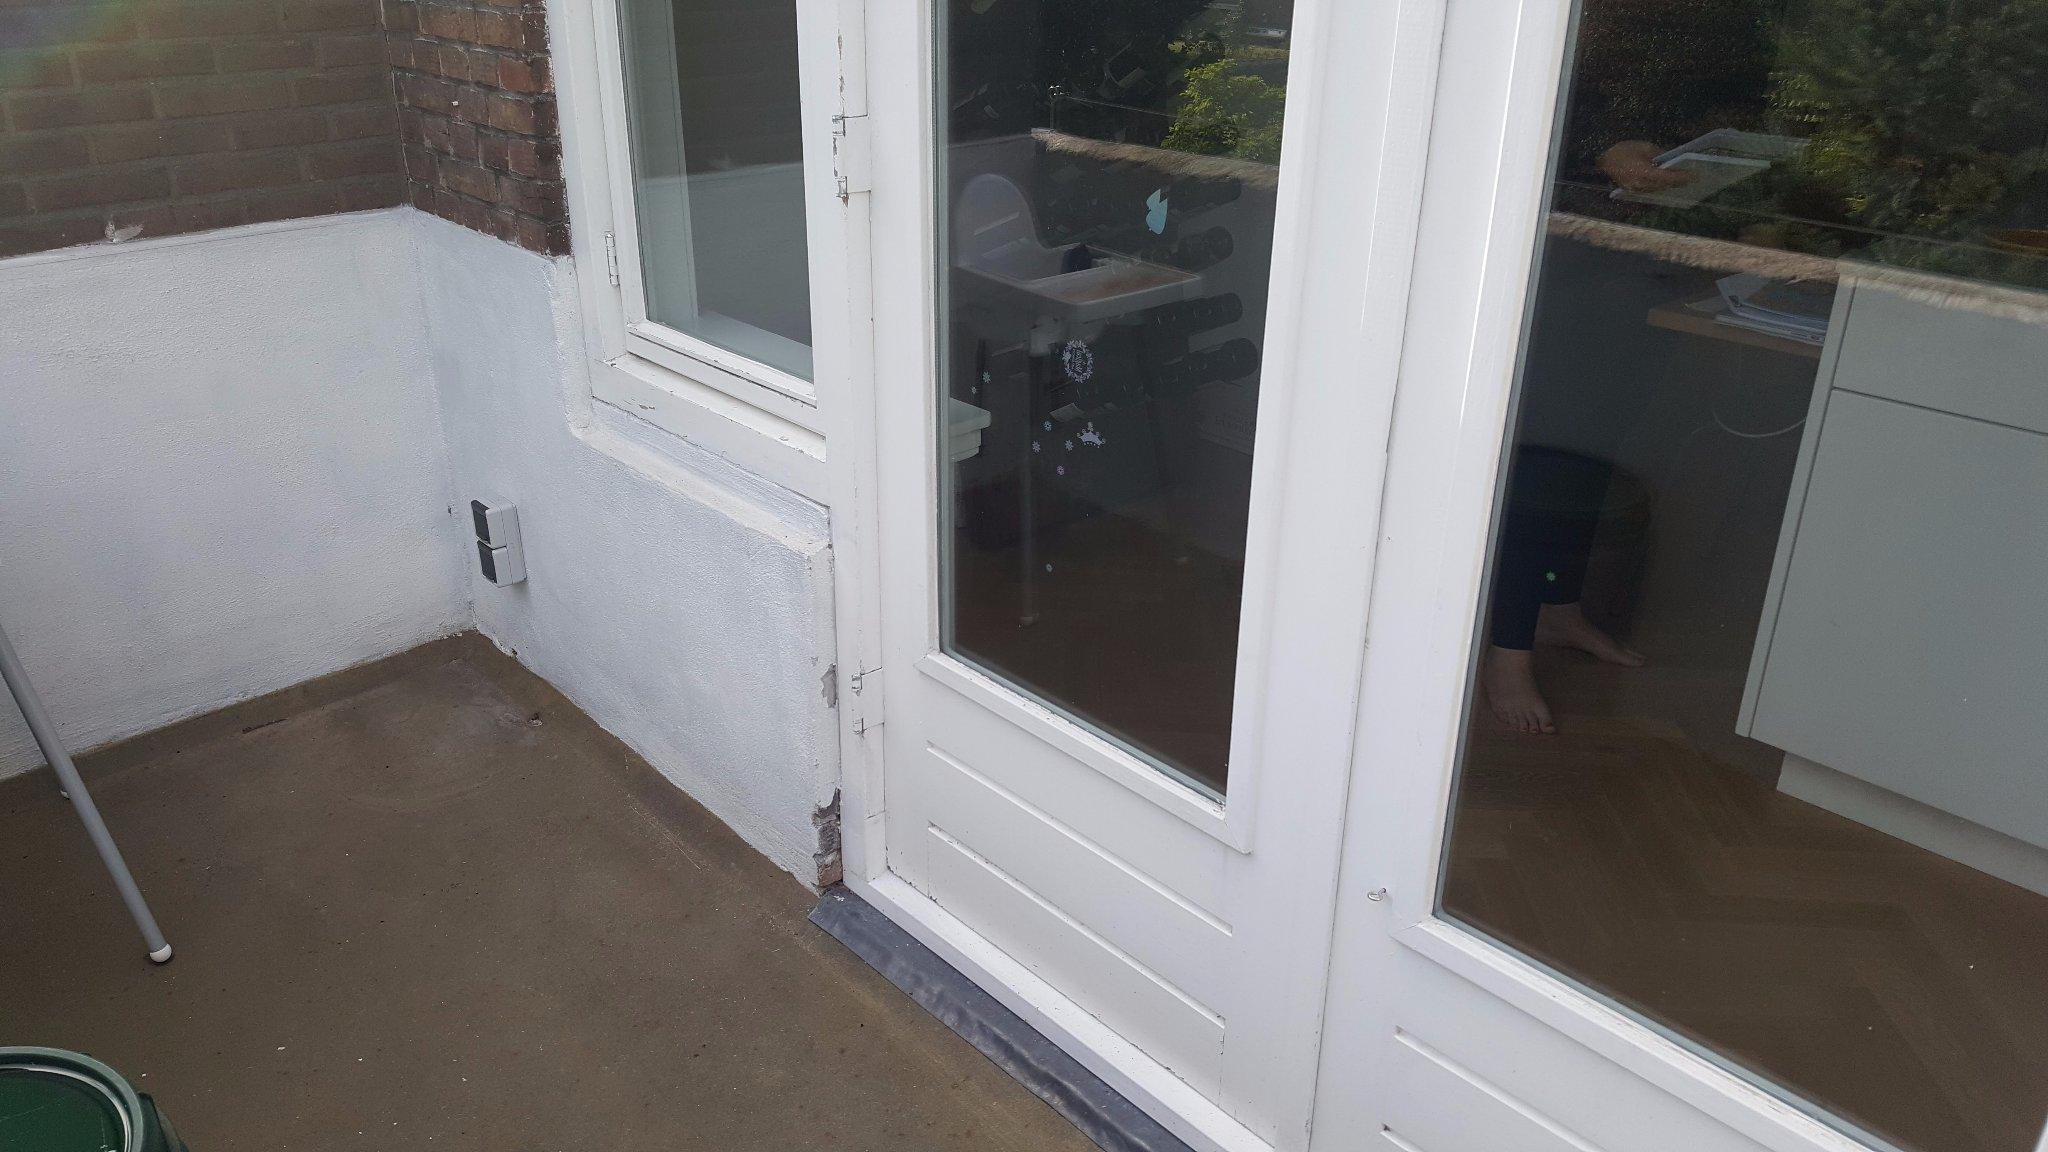 Vloer Voor Balkon : Houten vloer op balkon leggen werkspot